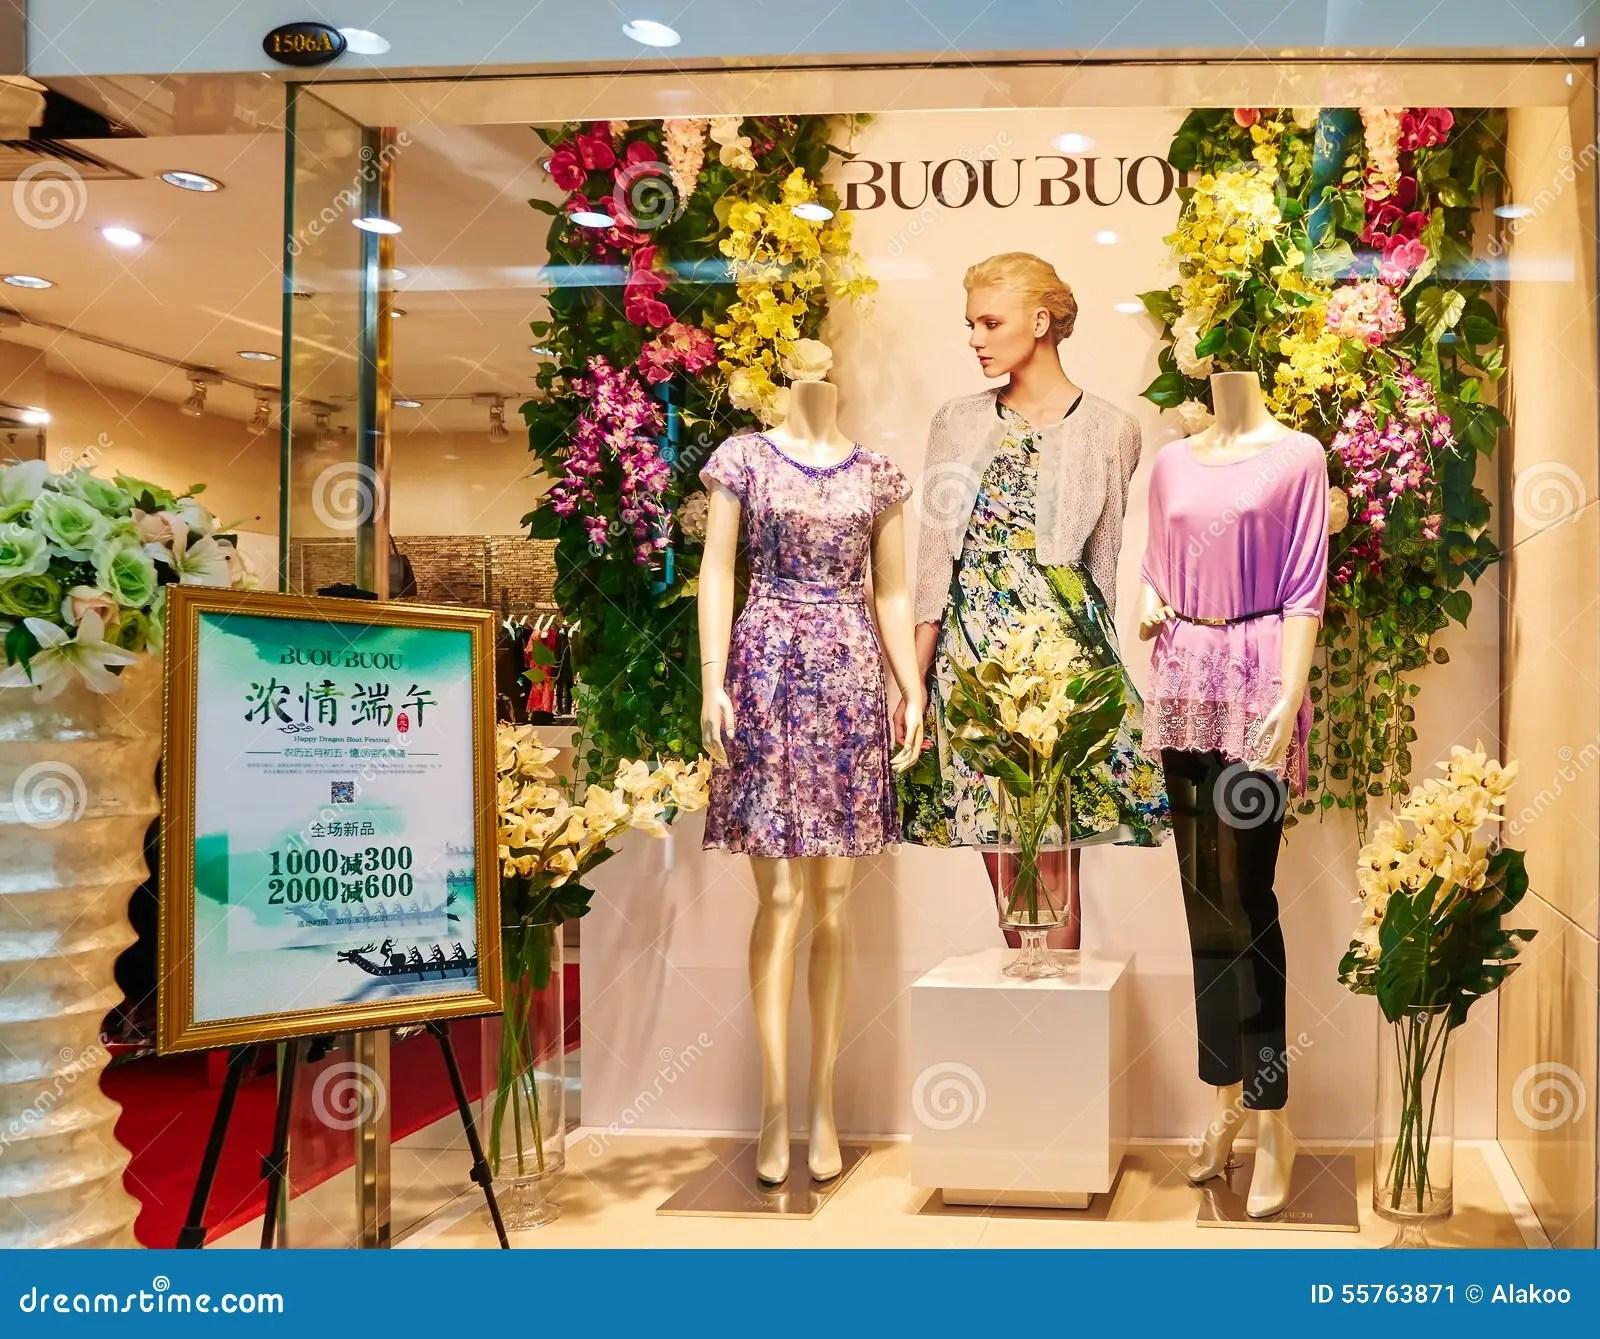 Fashion Boutique Clothes Shop Clothing Store Window